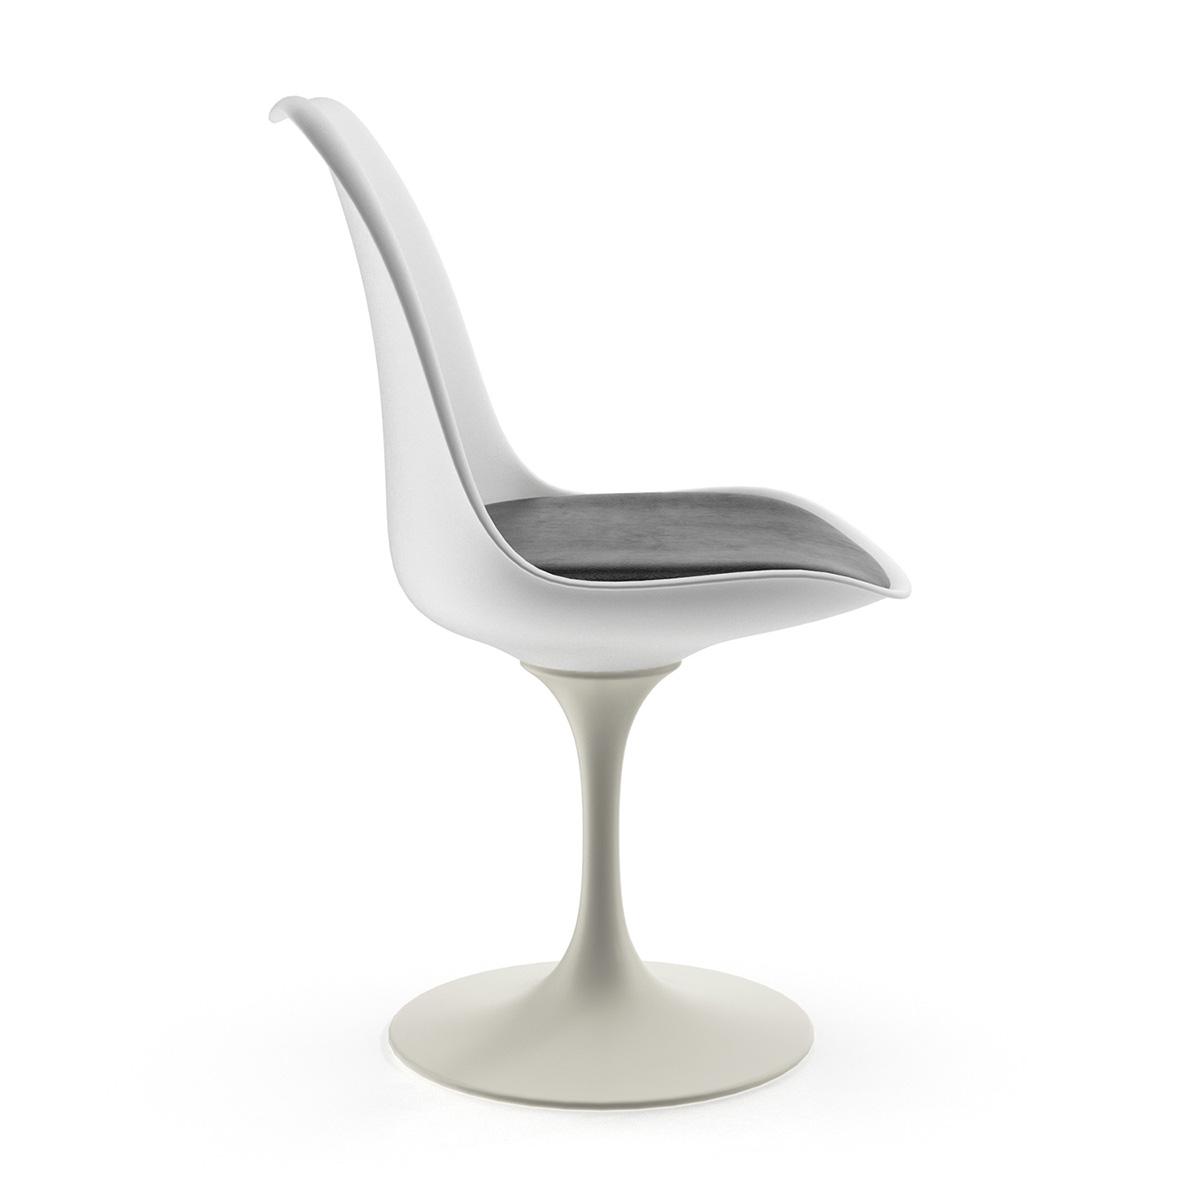 Strange Saarinen Style Tulip Side Chair Andrewgaddart Wooden Chair Designs For Living Room Andrewgaddartcom